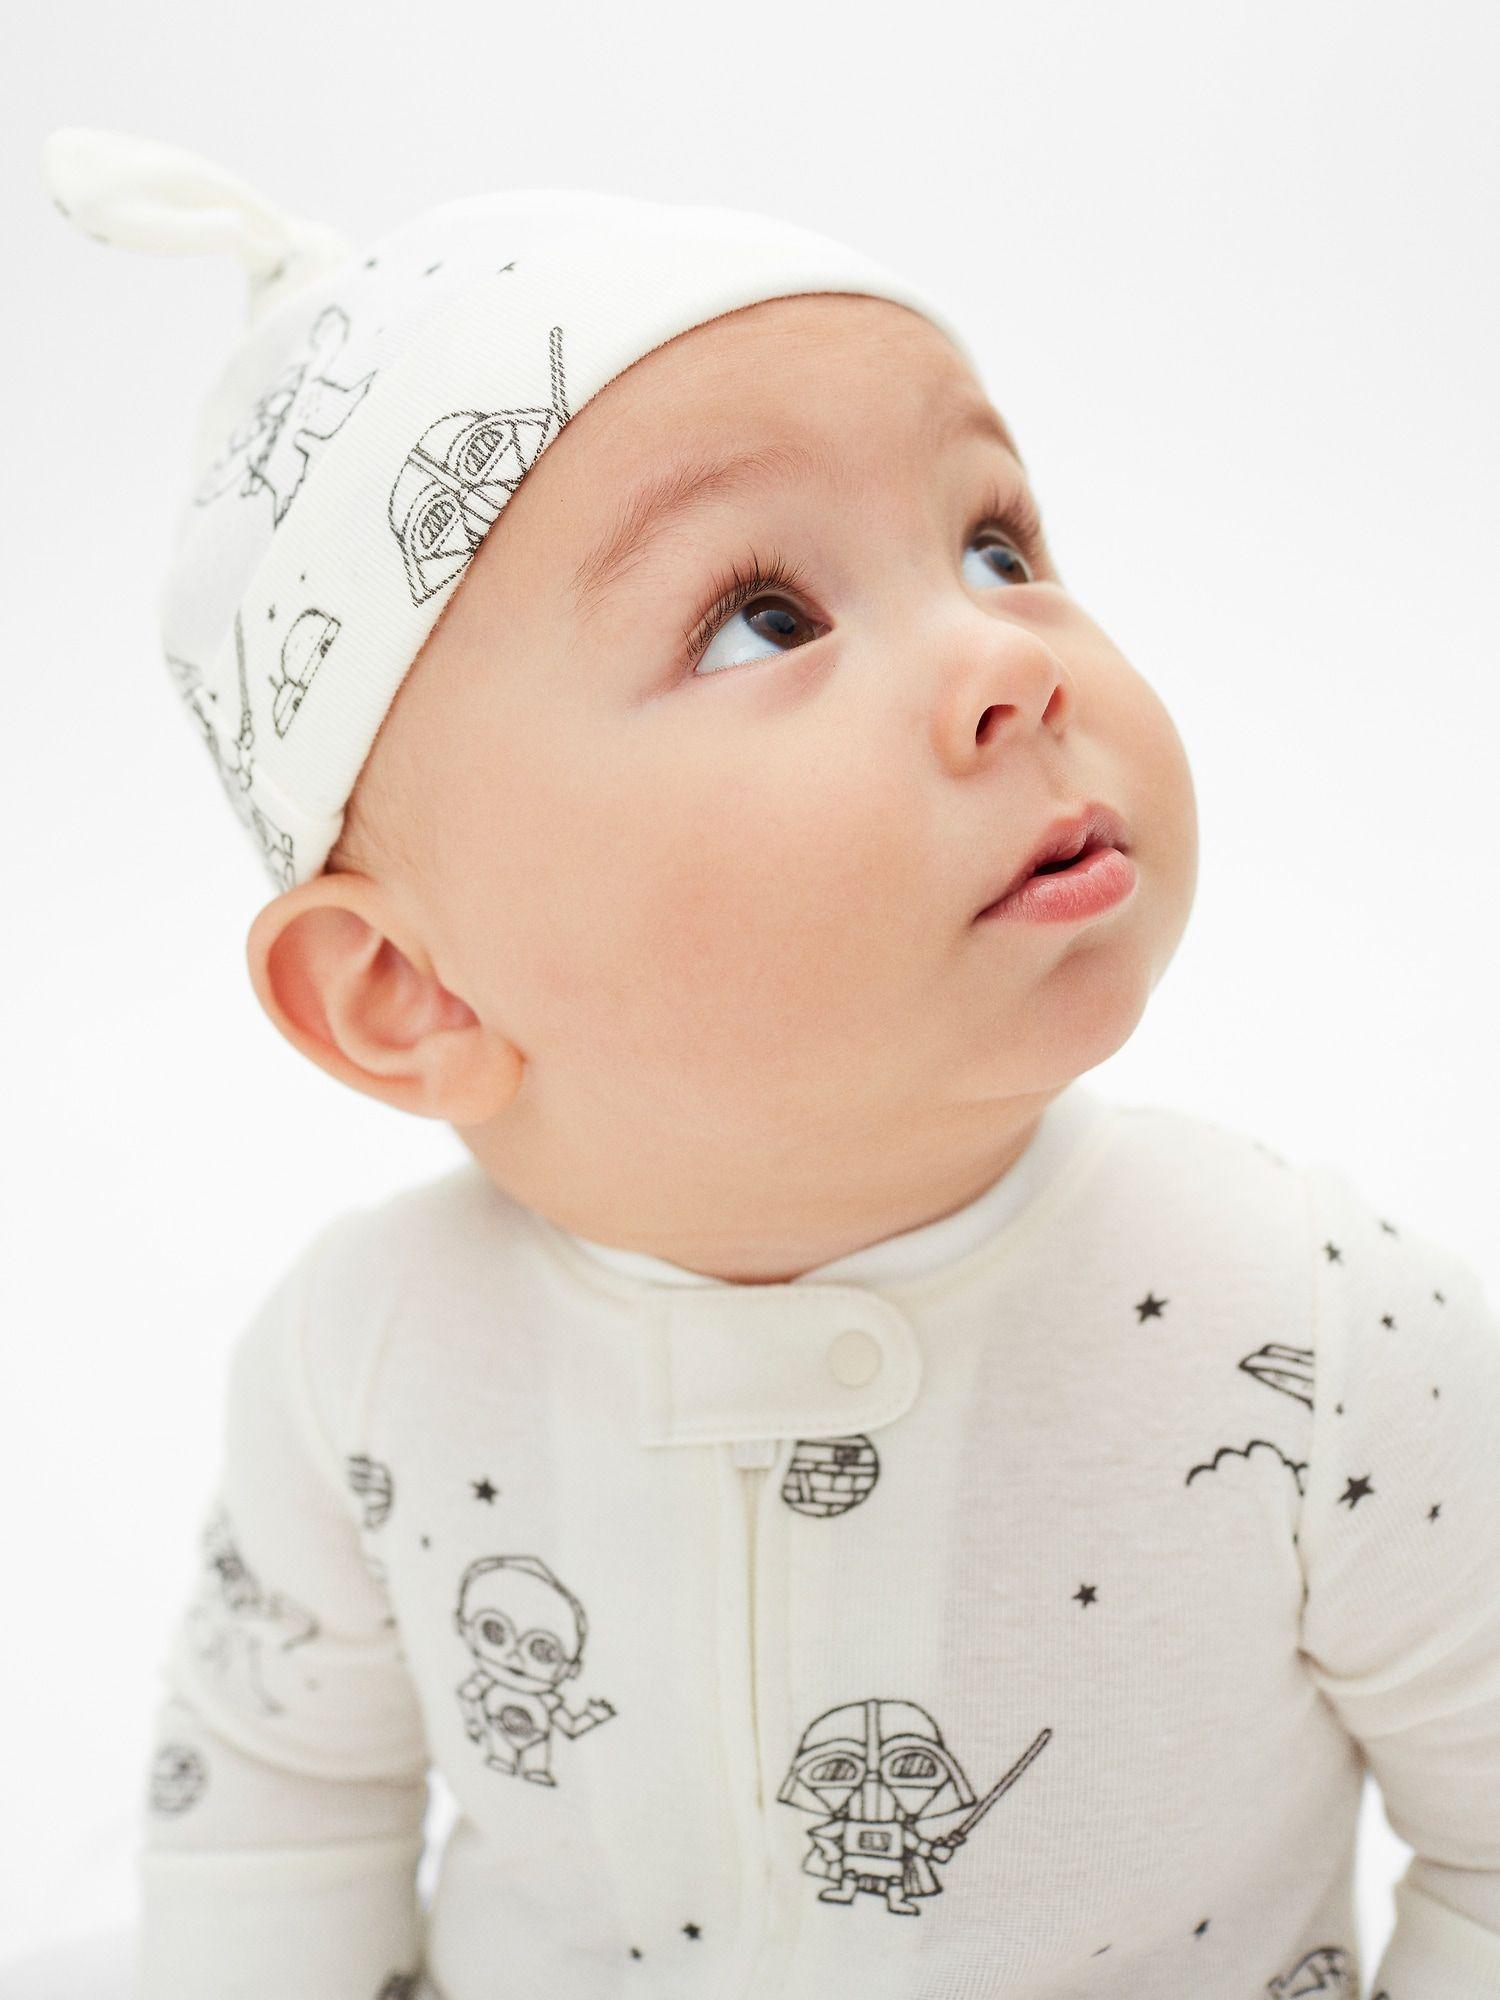 Baby Girlsbodysuits Amp Topsoldnavy Kid Style T Bebe